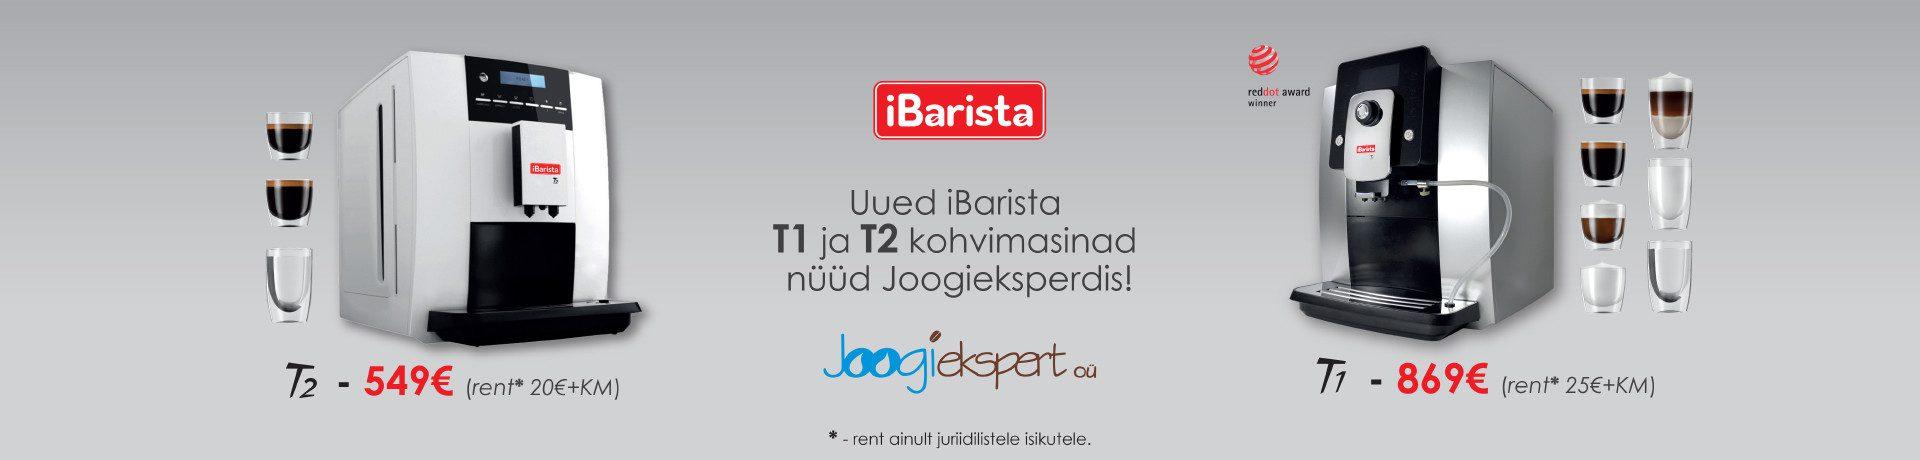 iBarista_T1_T2 bännerid JE copy_01